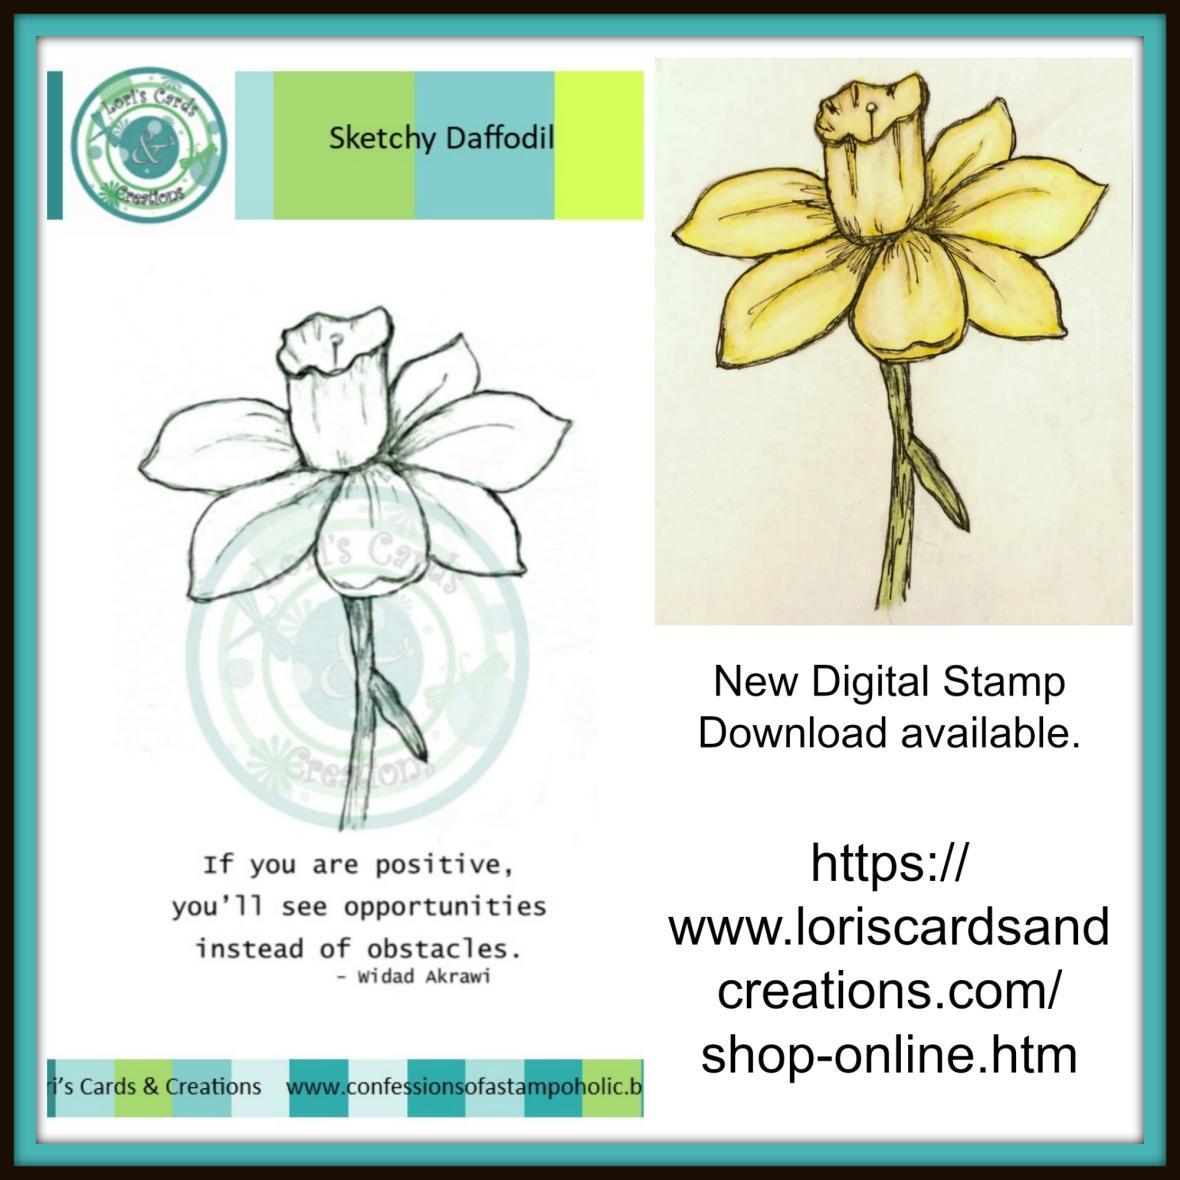 Sketchy Daffodil promo.jpg